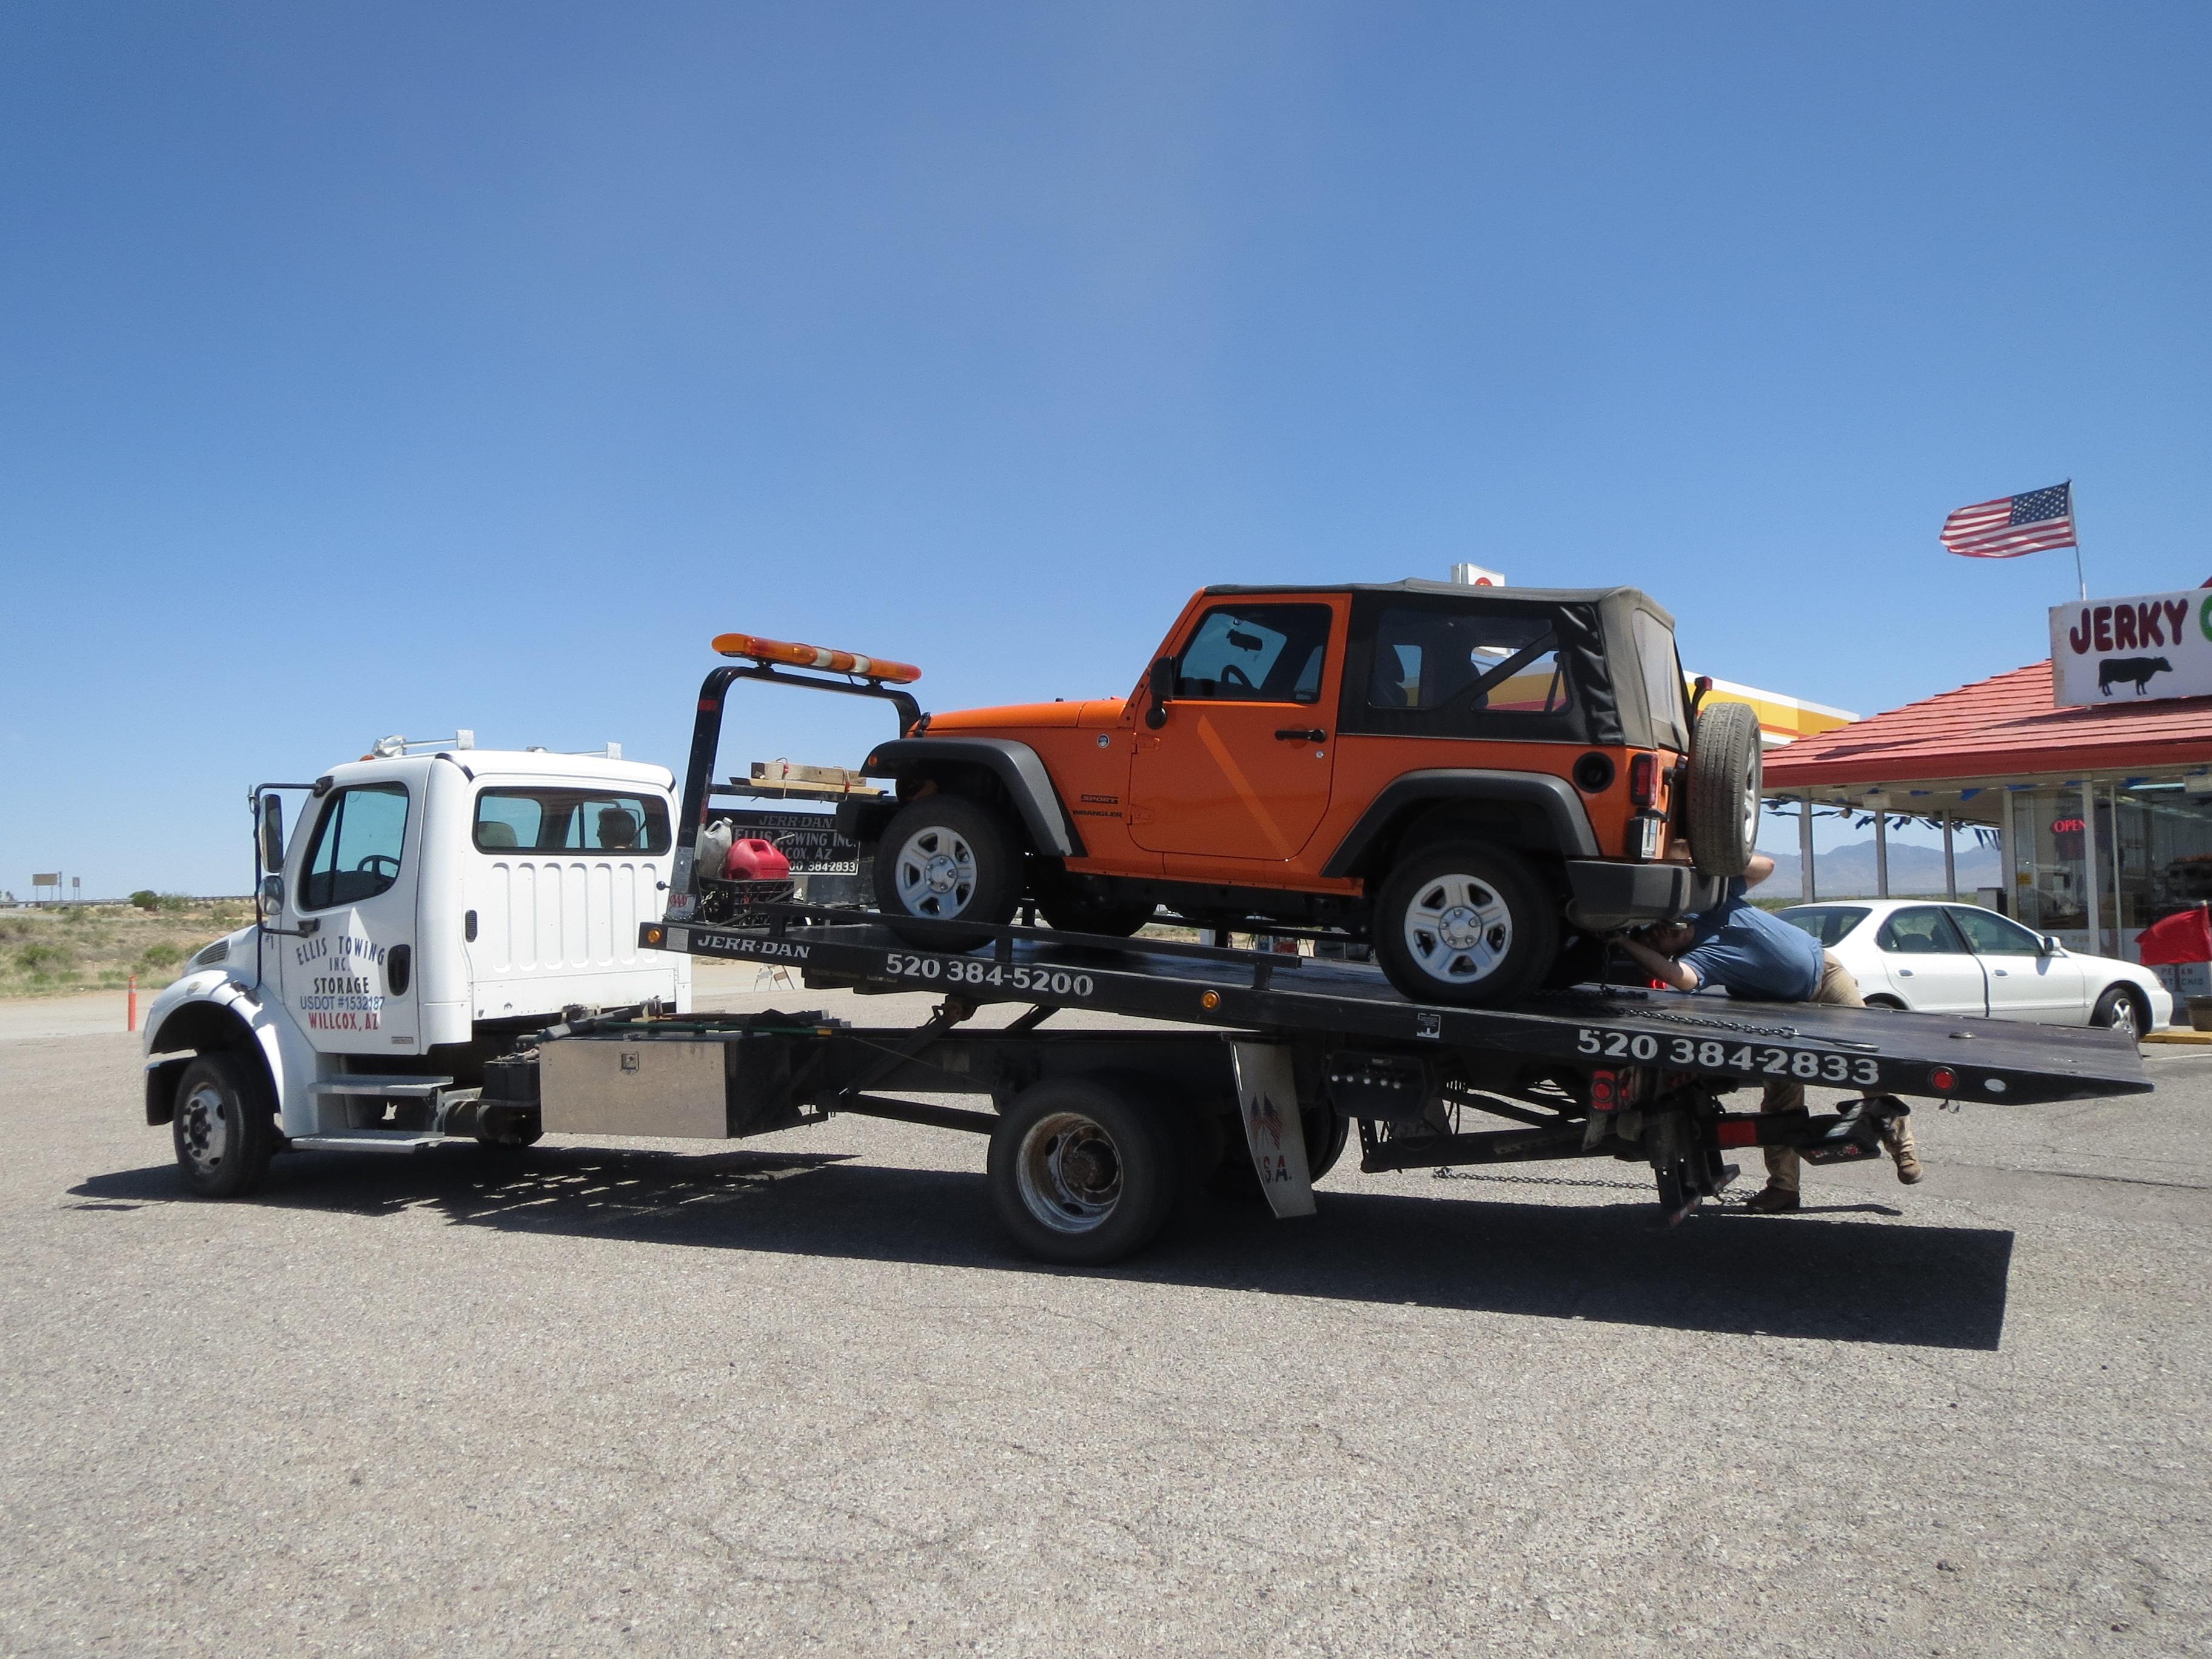 Flat Tire Tow Truck